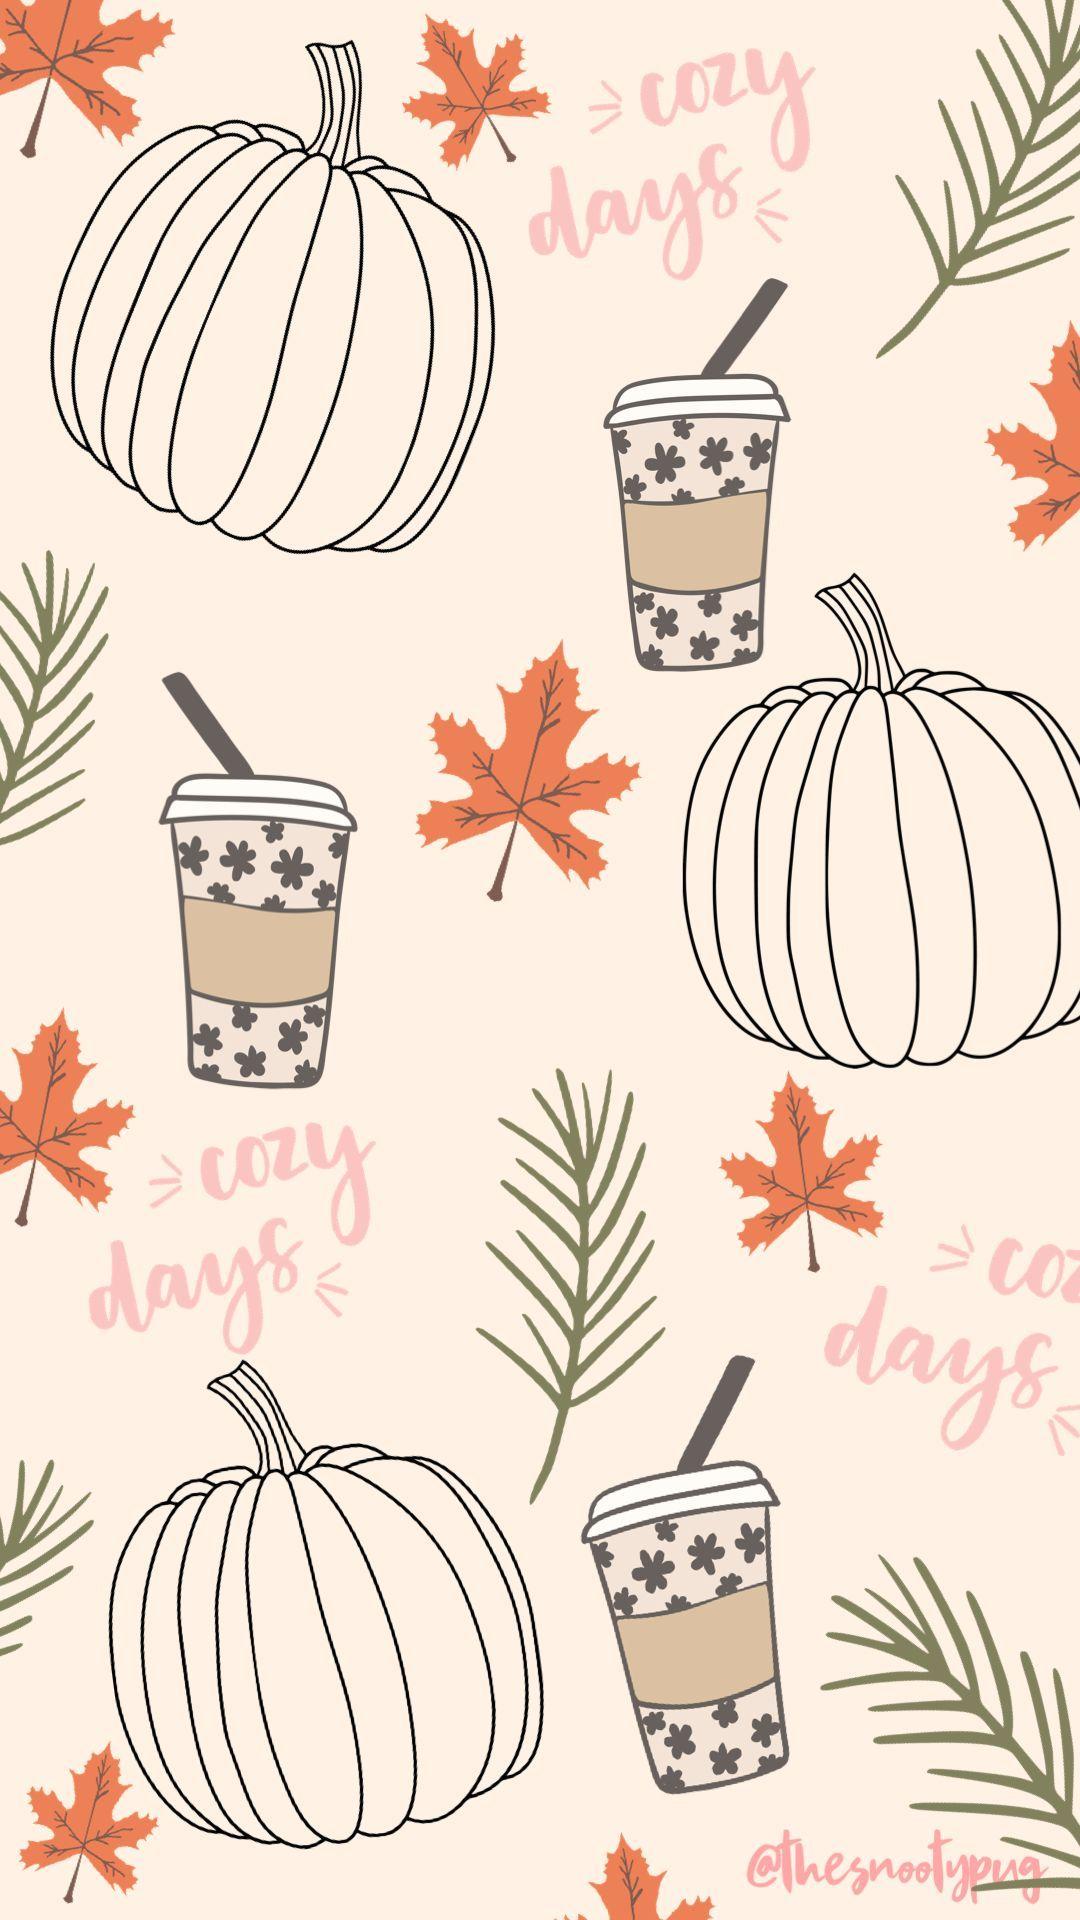 Fall Wallpapers Iphone Wallpaper Fall Halloween Wallpaper Iphone Cute Fall Wallpaper